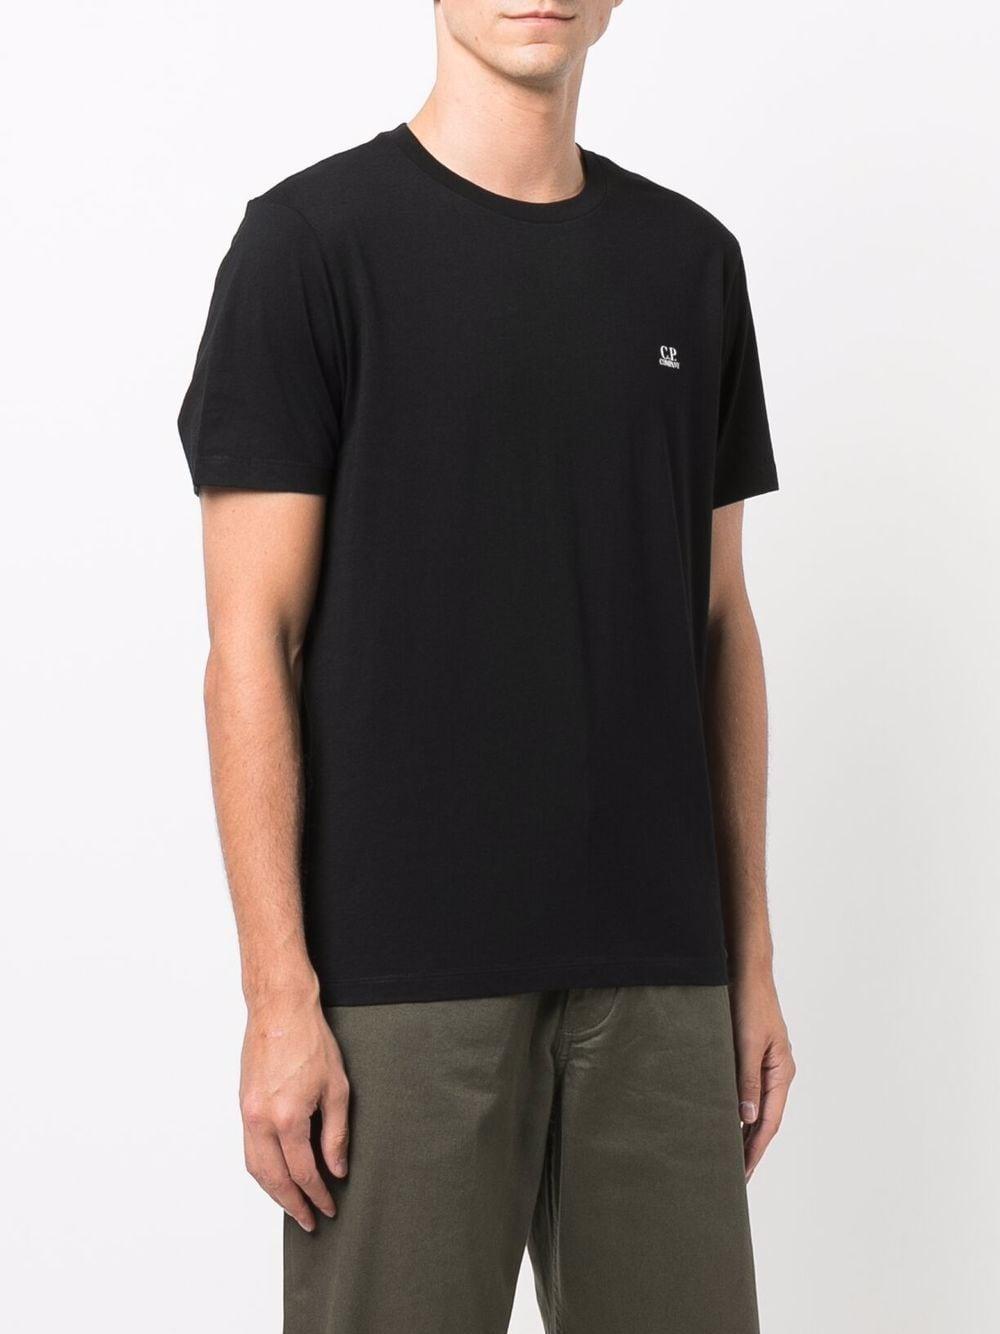 logo t-shirt man black in cotton C.P. COMPANY | T-shirts | 11CMTS037A005100W999